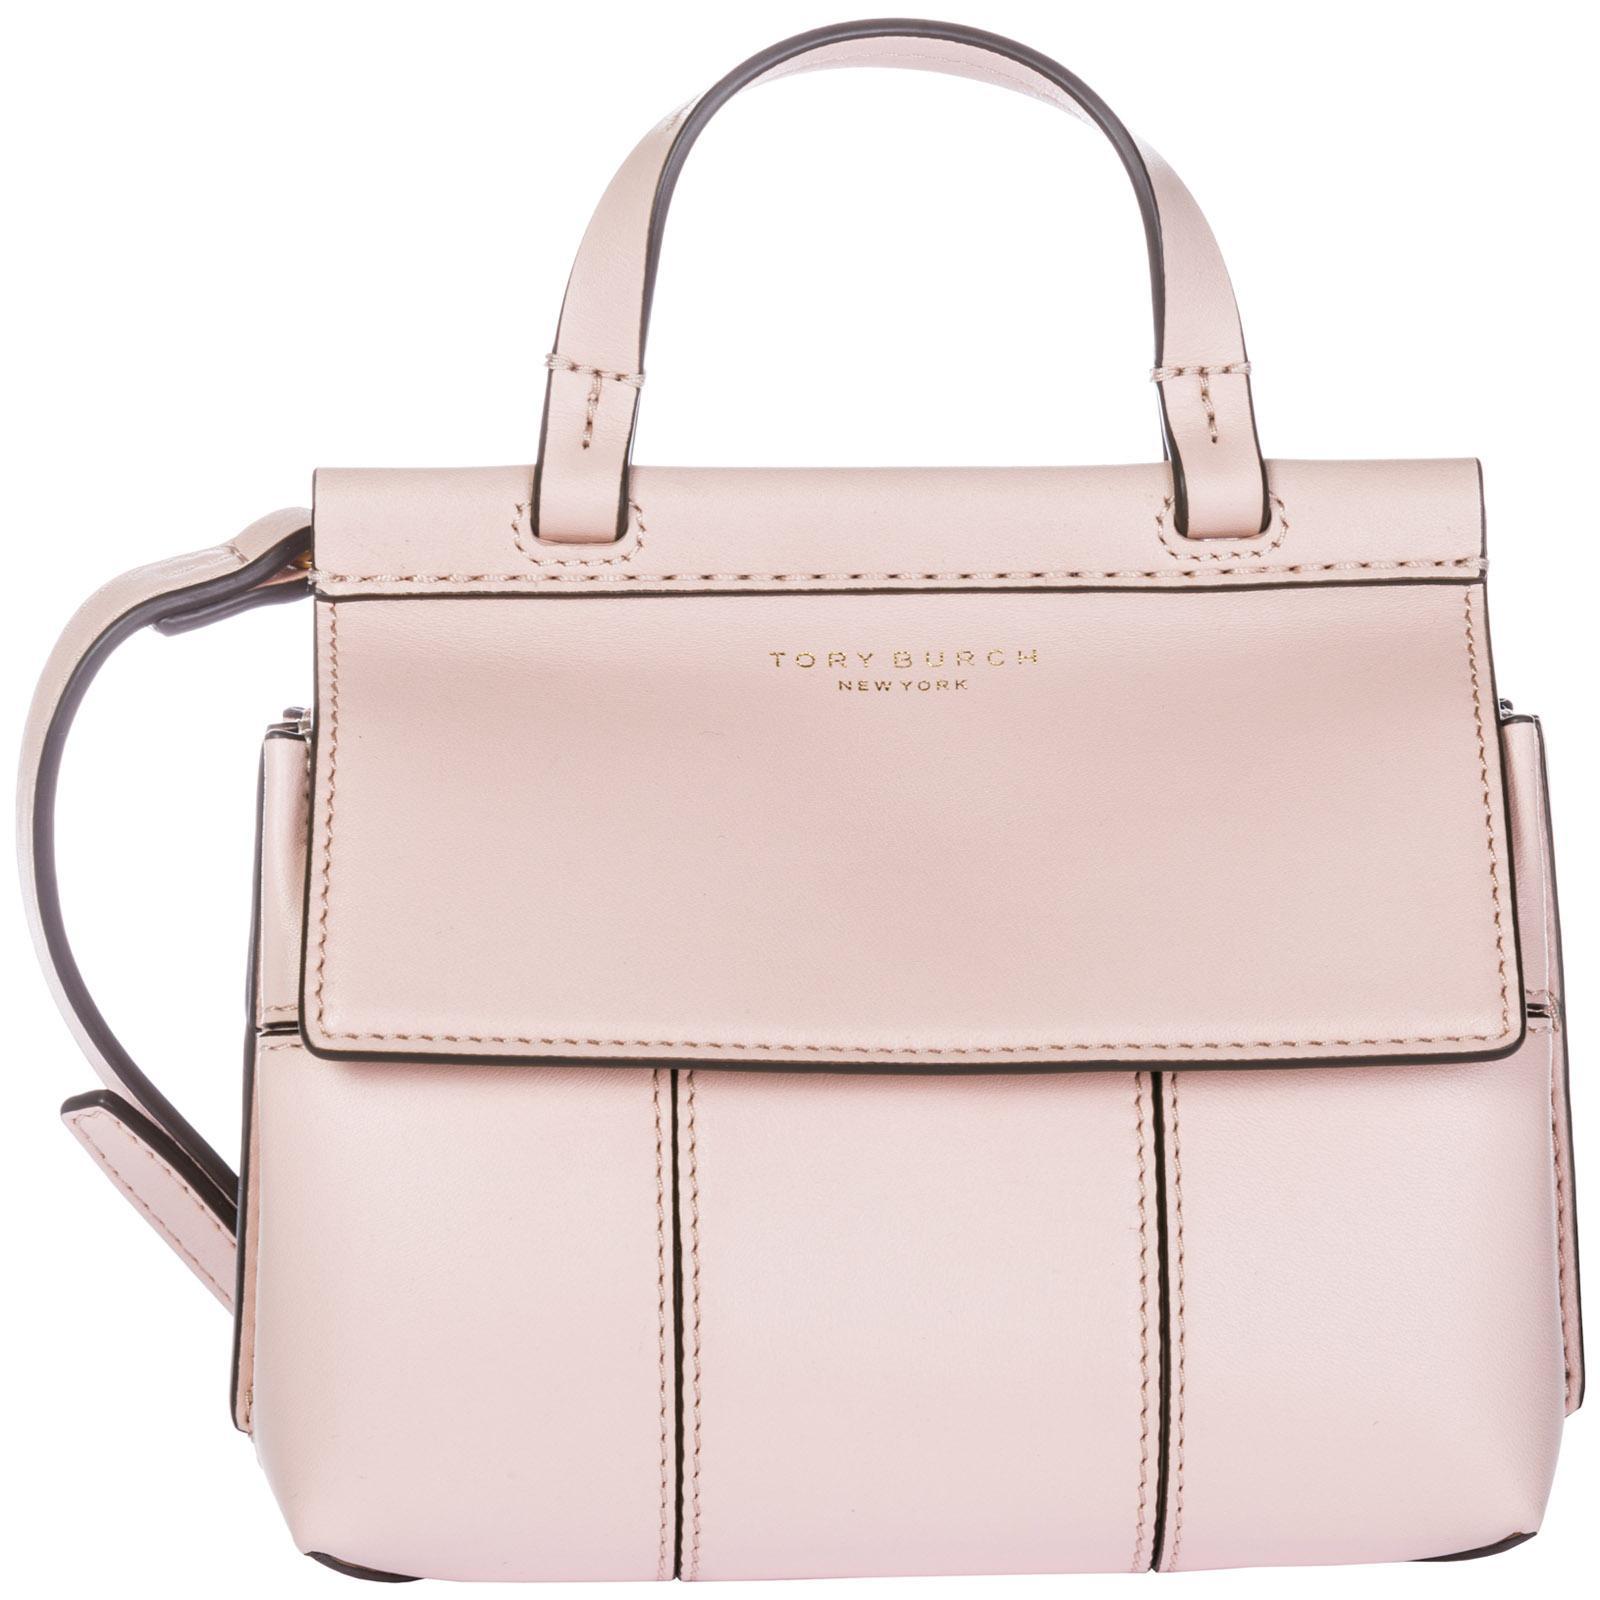 42fcc2e93a4 Tory Burch Women's Handbag Cross-Body Messenger Bag Purse Mini Satchel In  Pink